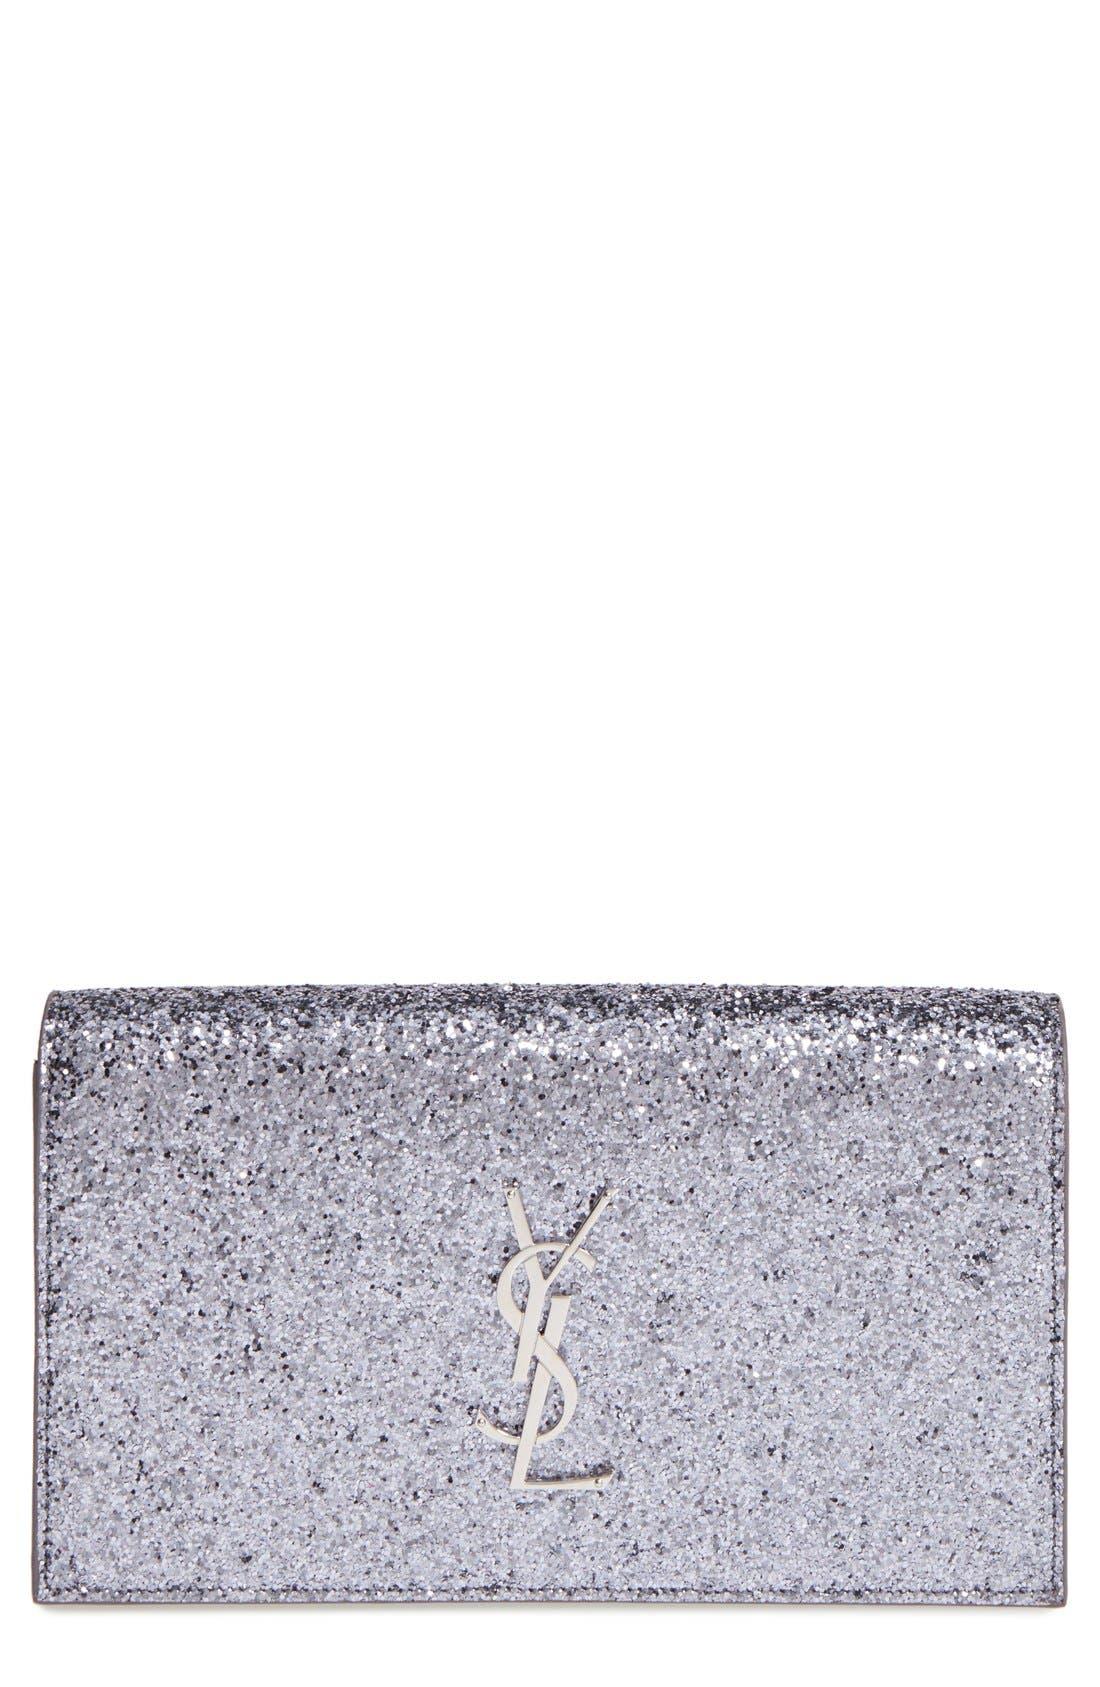 Main Image - Saint Laurent 'Monogram Kate' Glitter Clutch